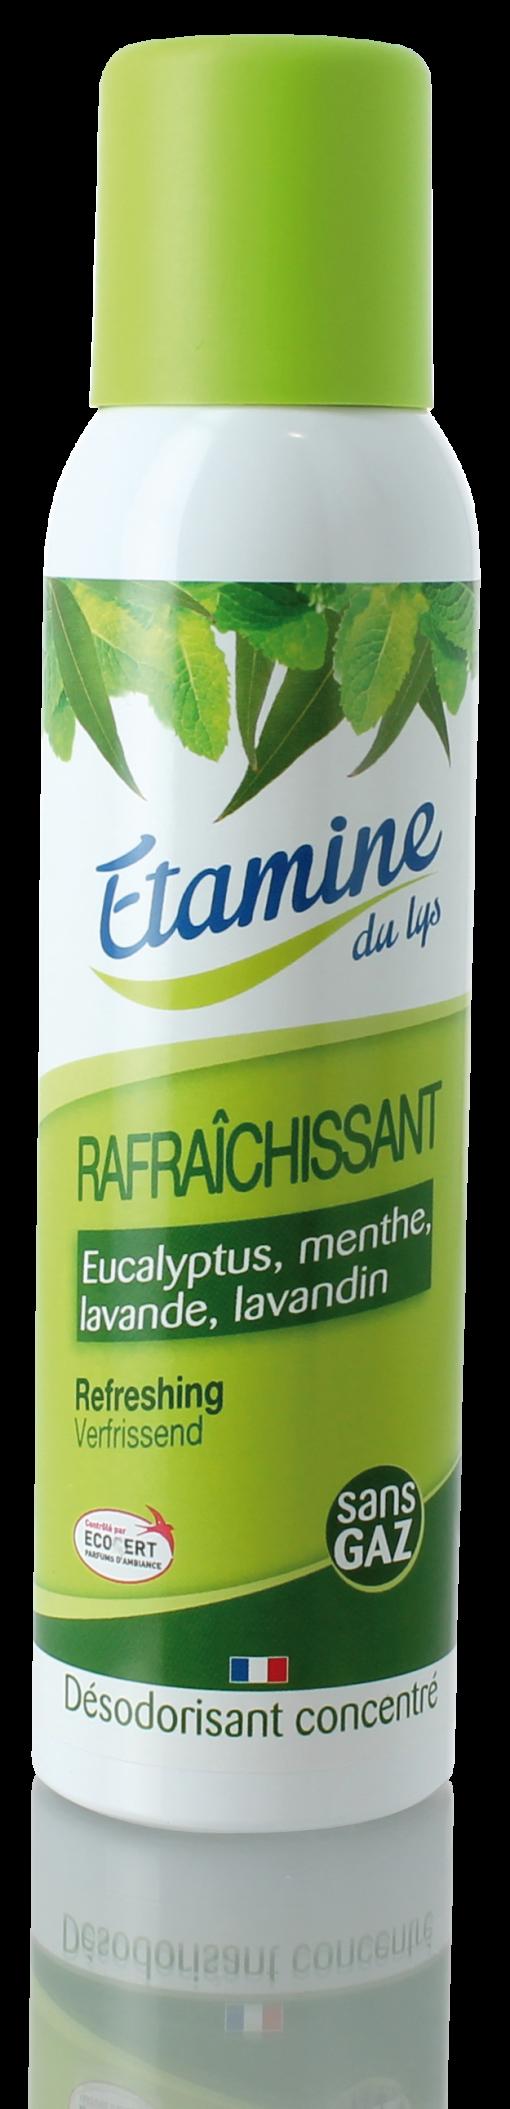 DESODORISANT RAFRAICHISSANT Flacon 125 ml sans gaz – label ecocert 1